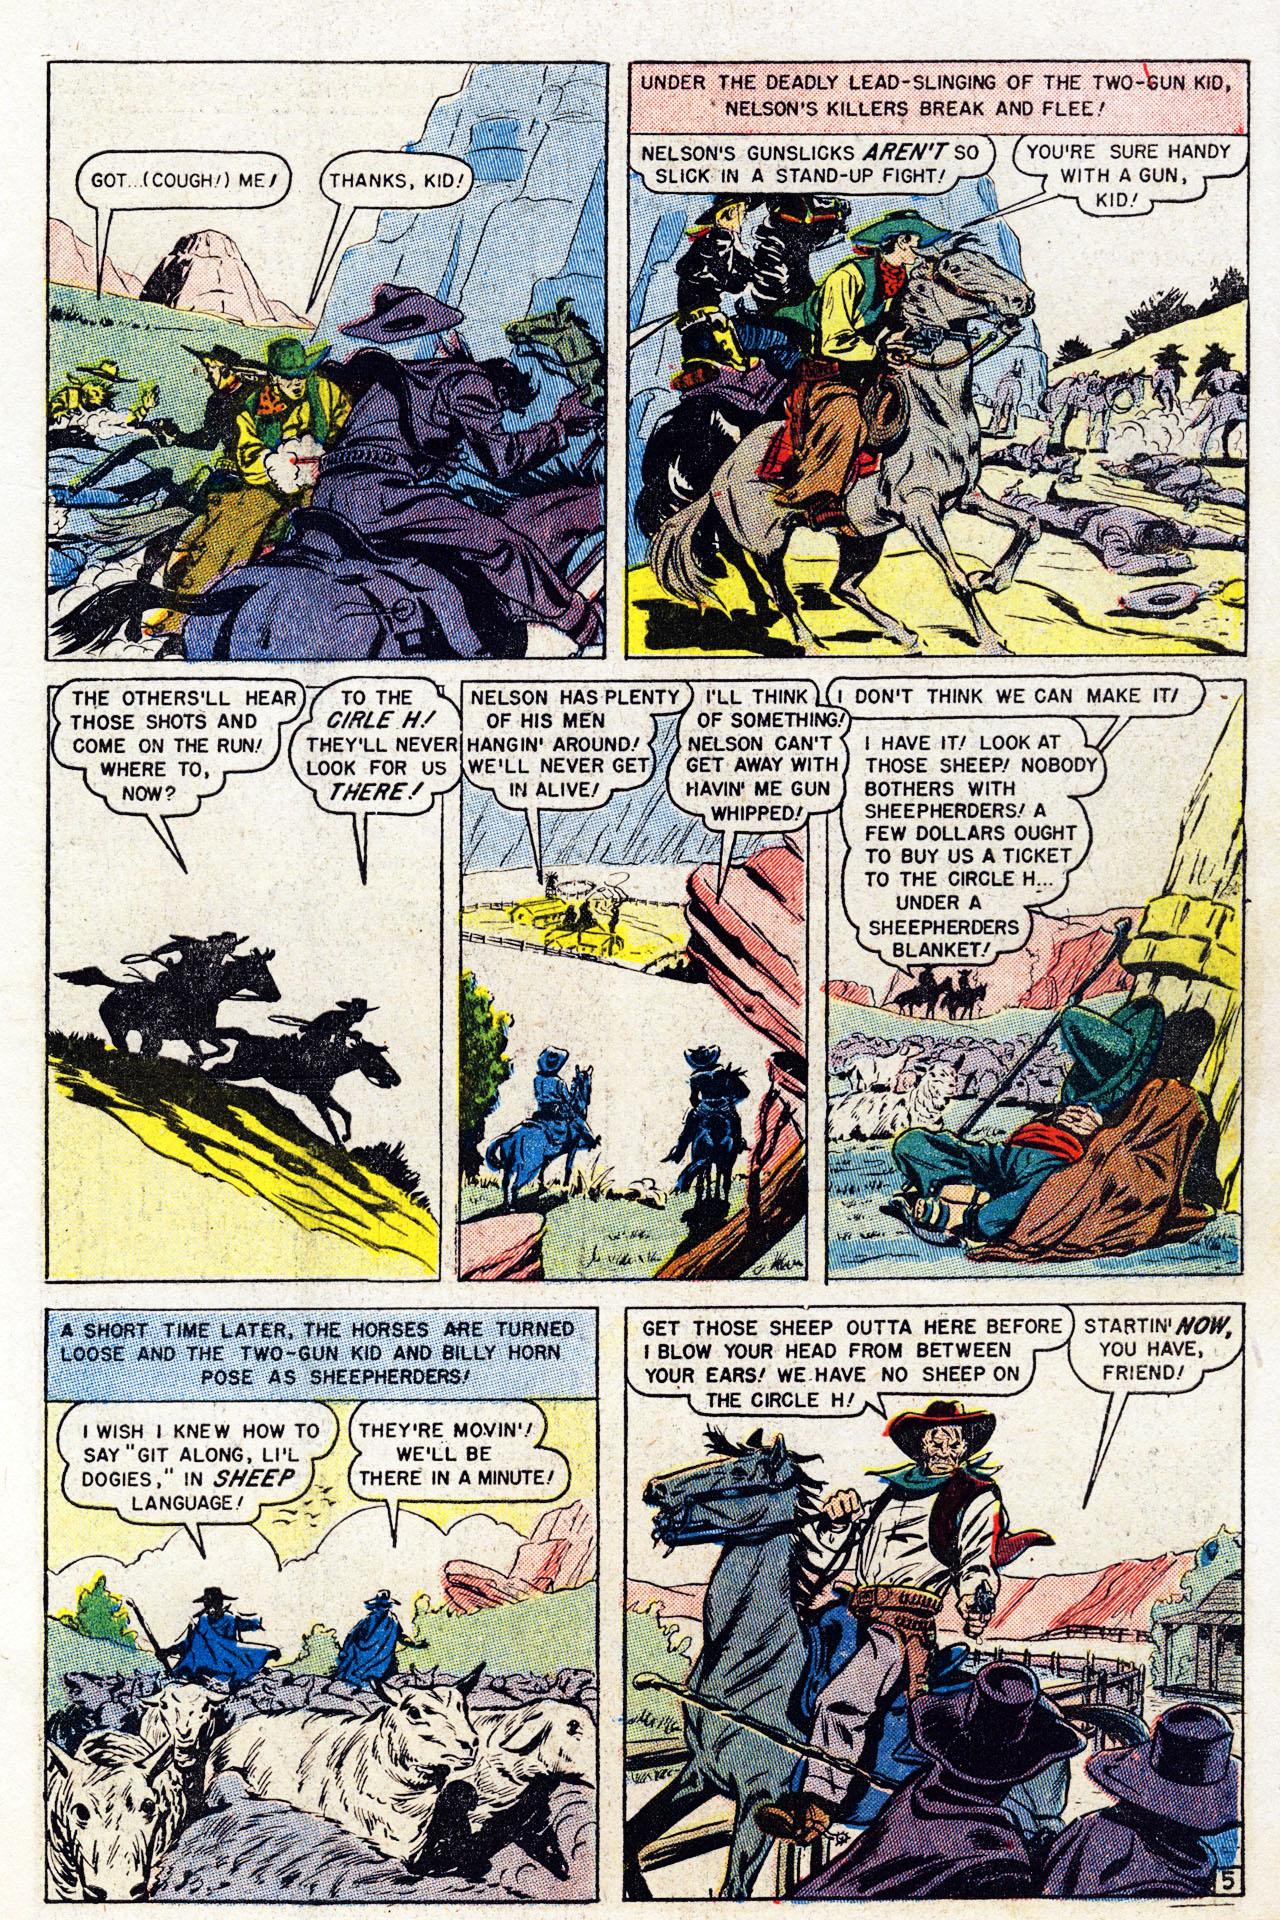 Read online Two-Gun Kid comic -  Issue #7 - 7